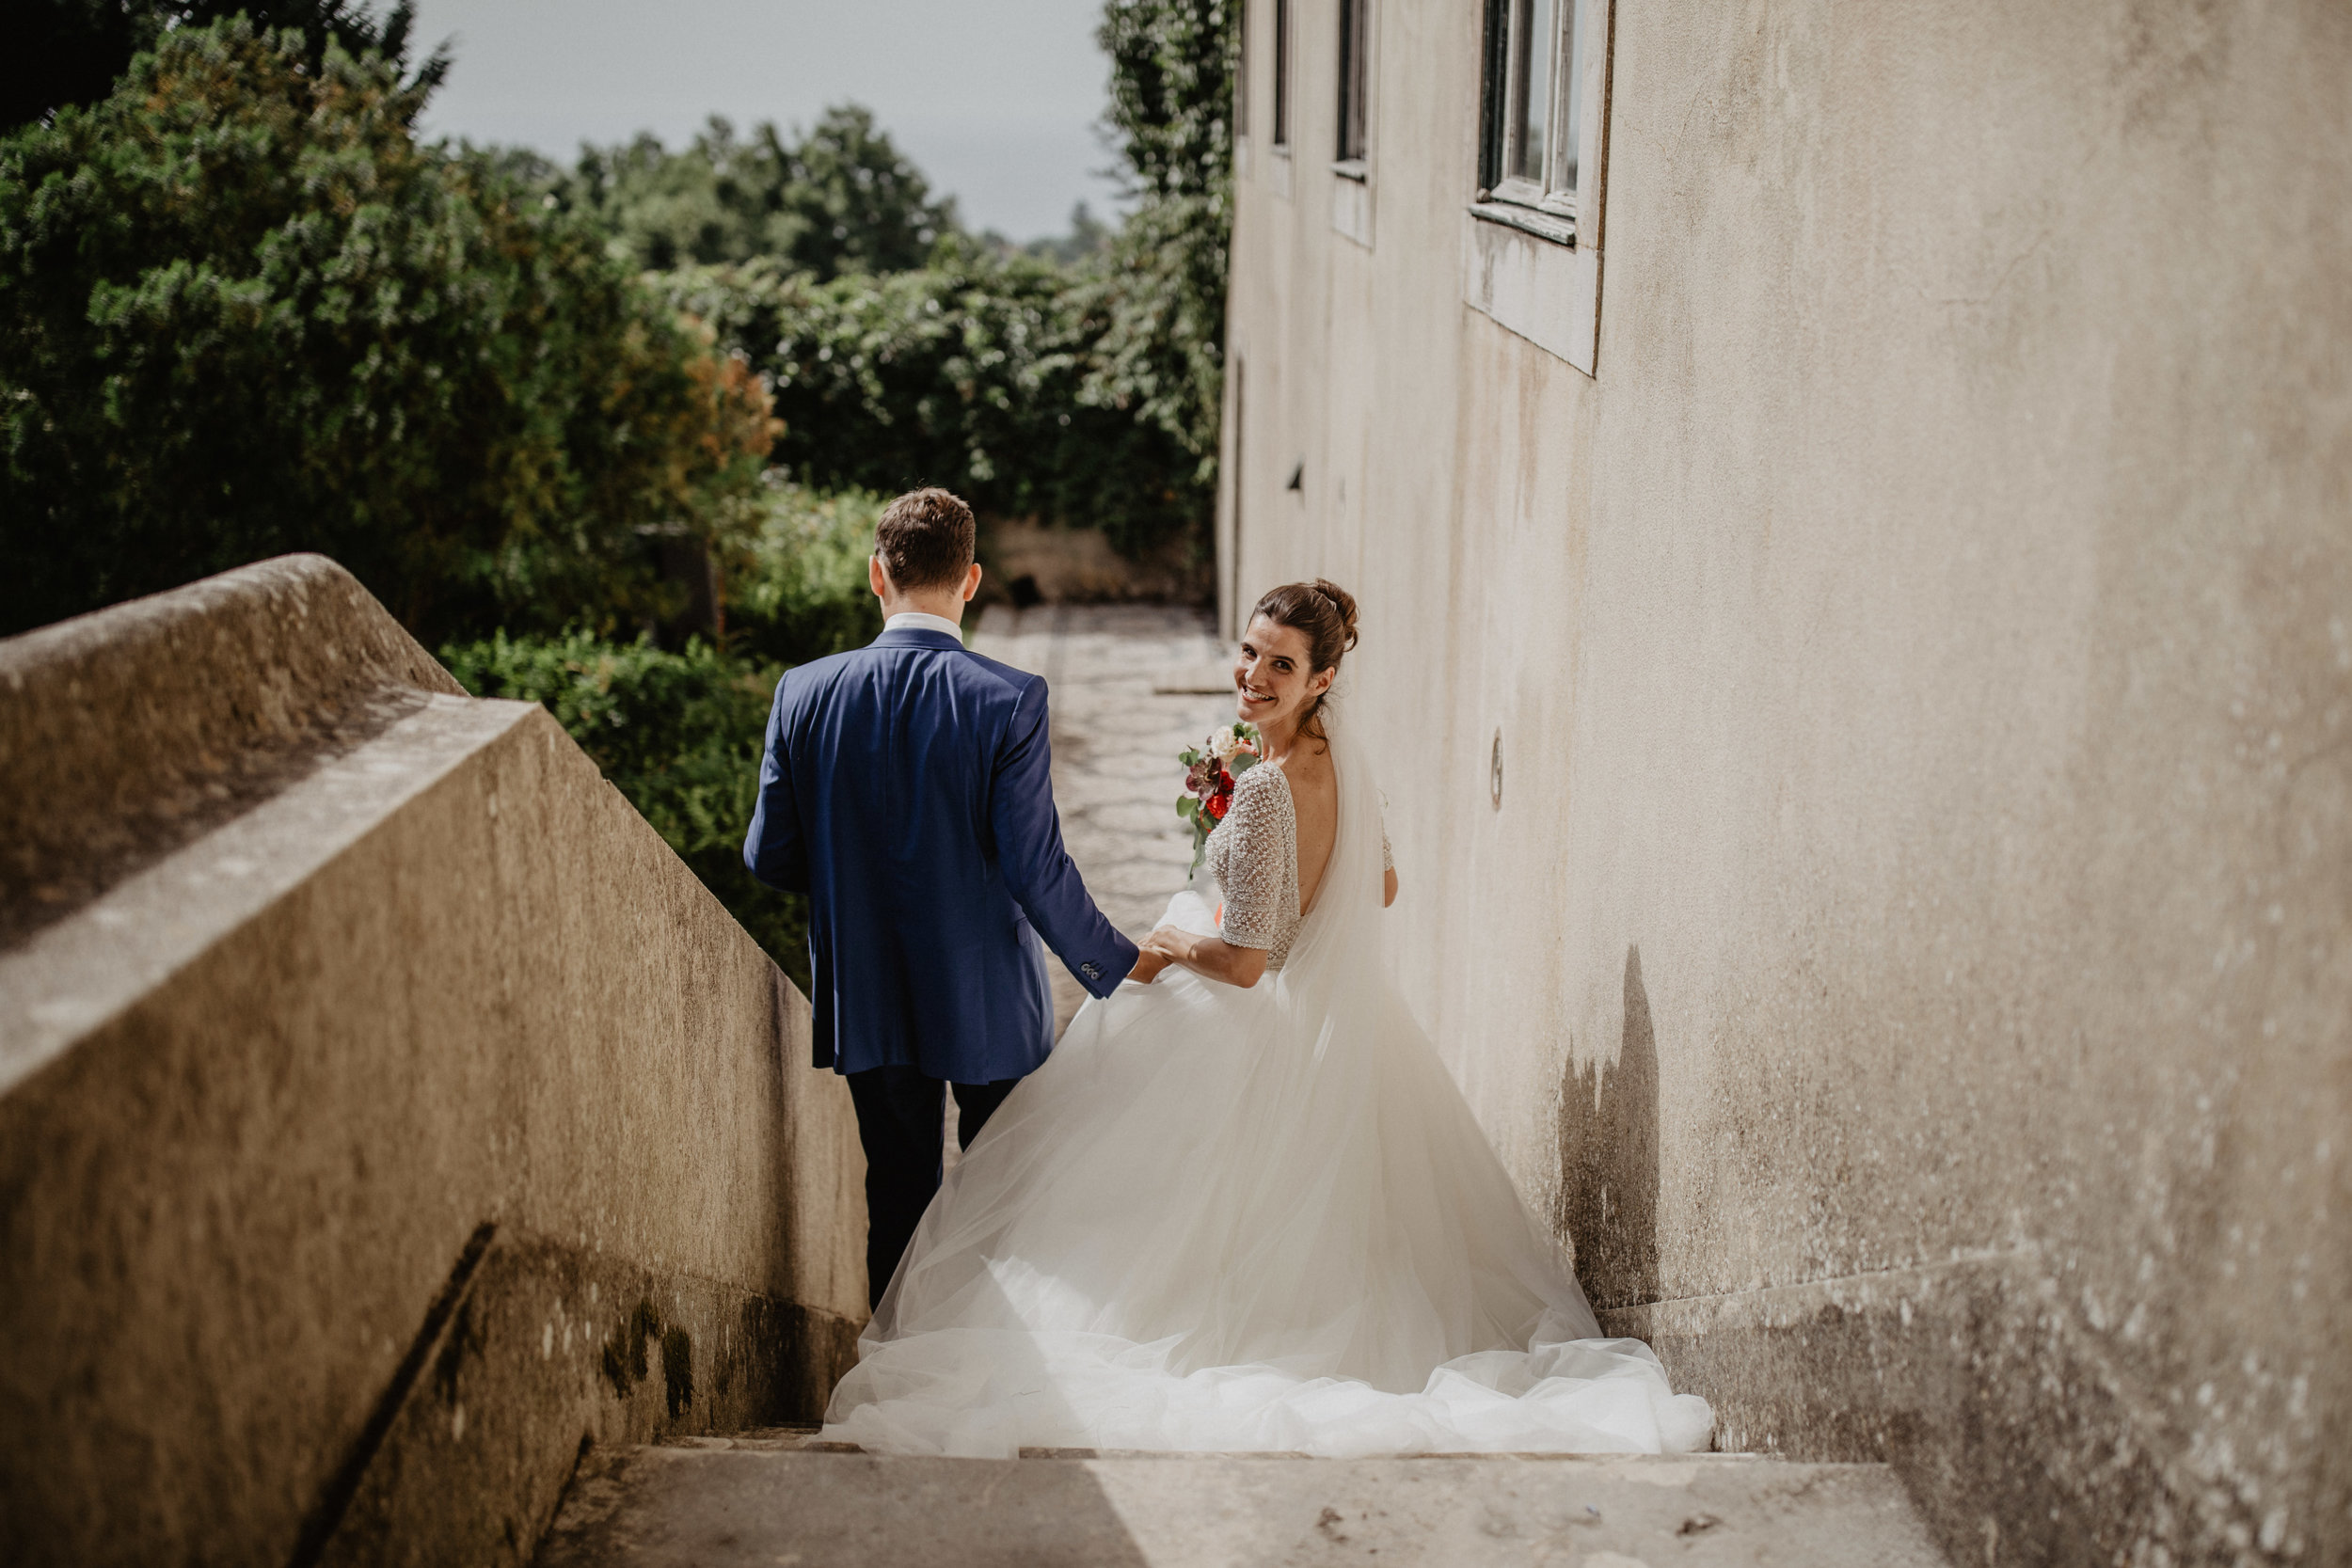 Lapela-photography-wedding-sintra-portugal-74.jpg